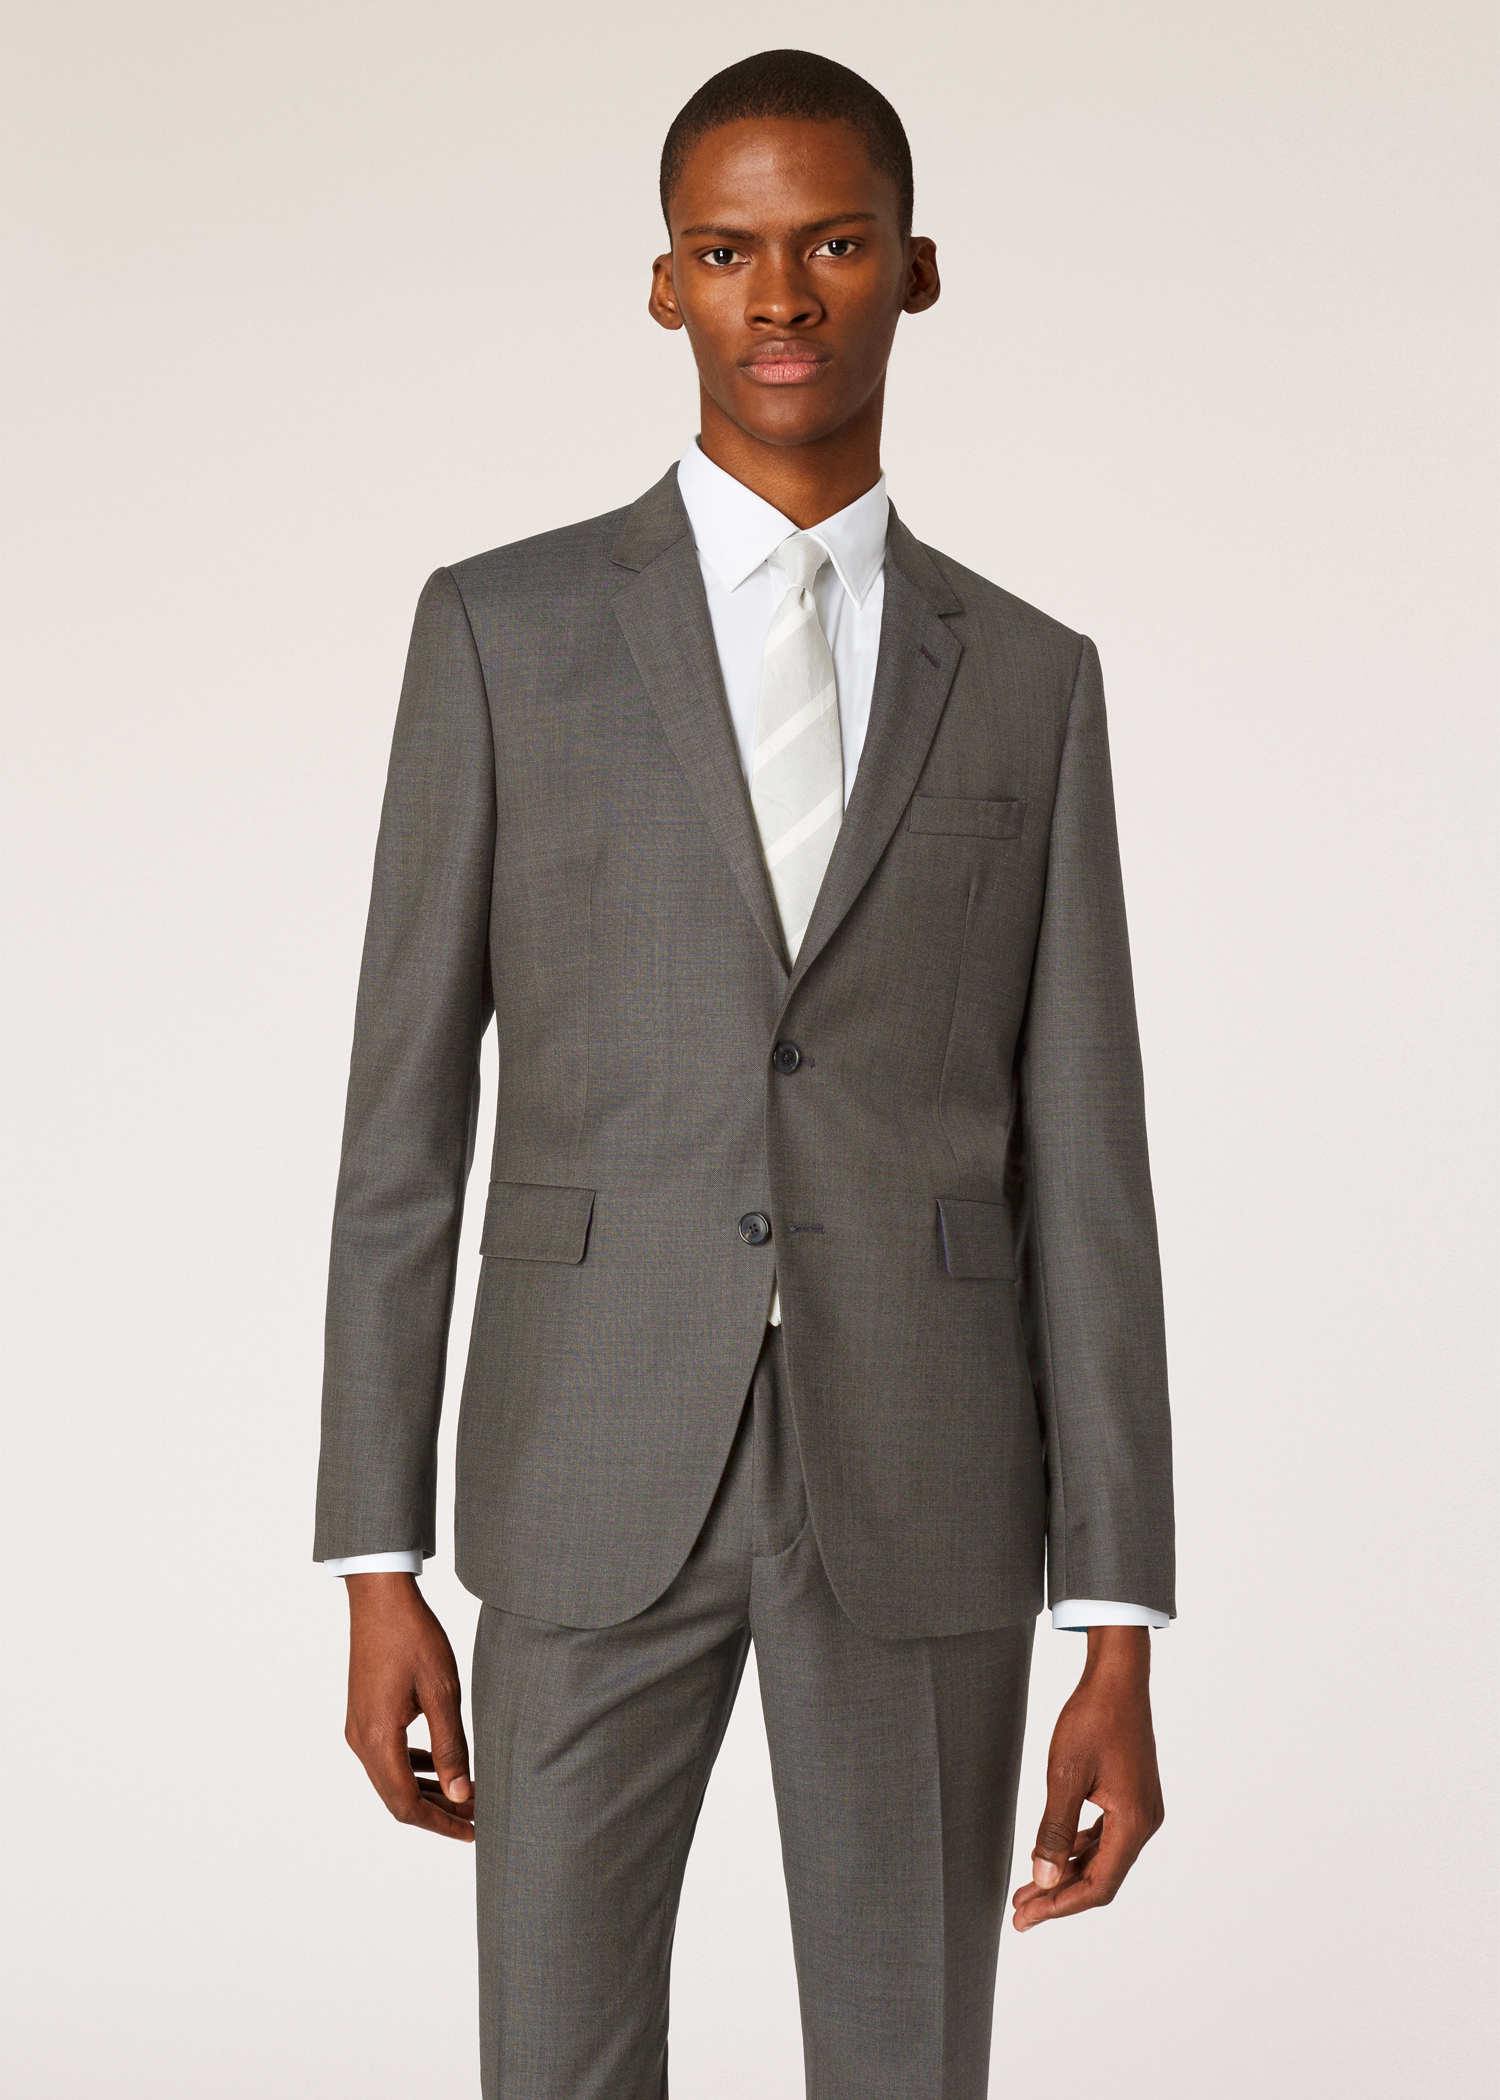 6d65a7bfa Model front close up - Men's Slim-Fit Charcoal Grey Wool Two-Button Suit